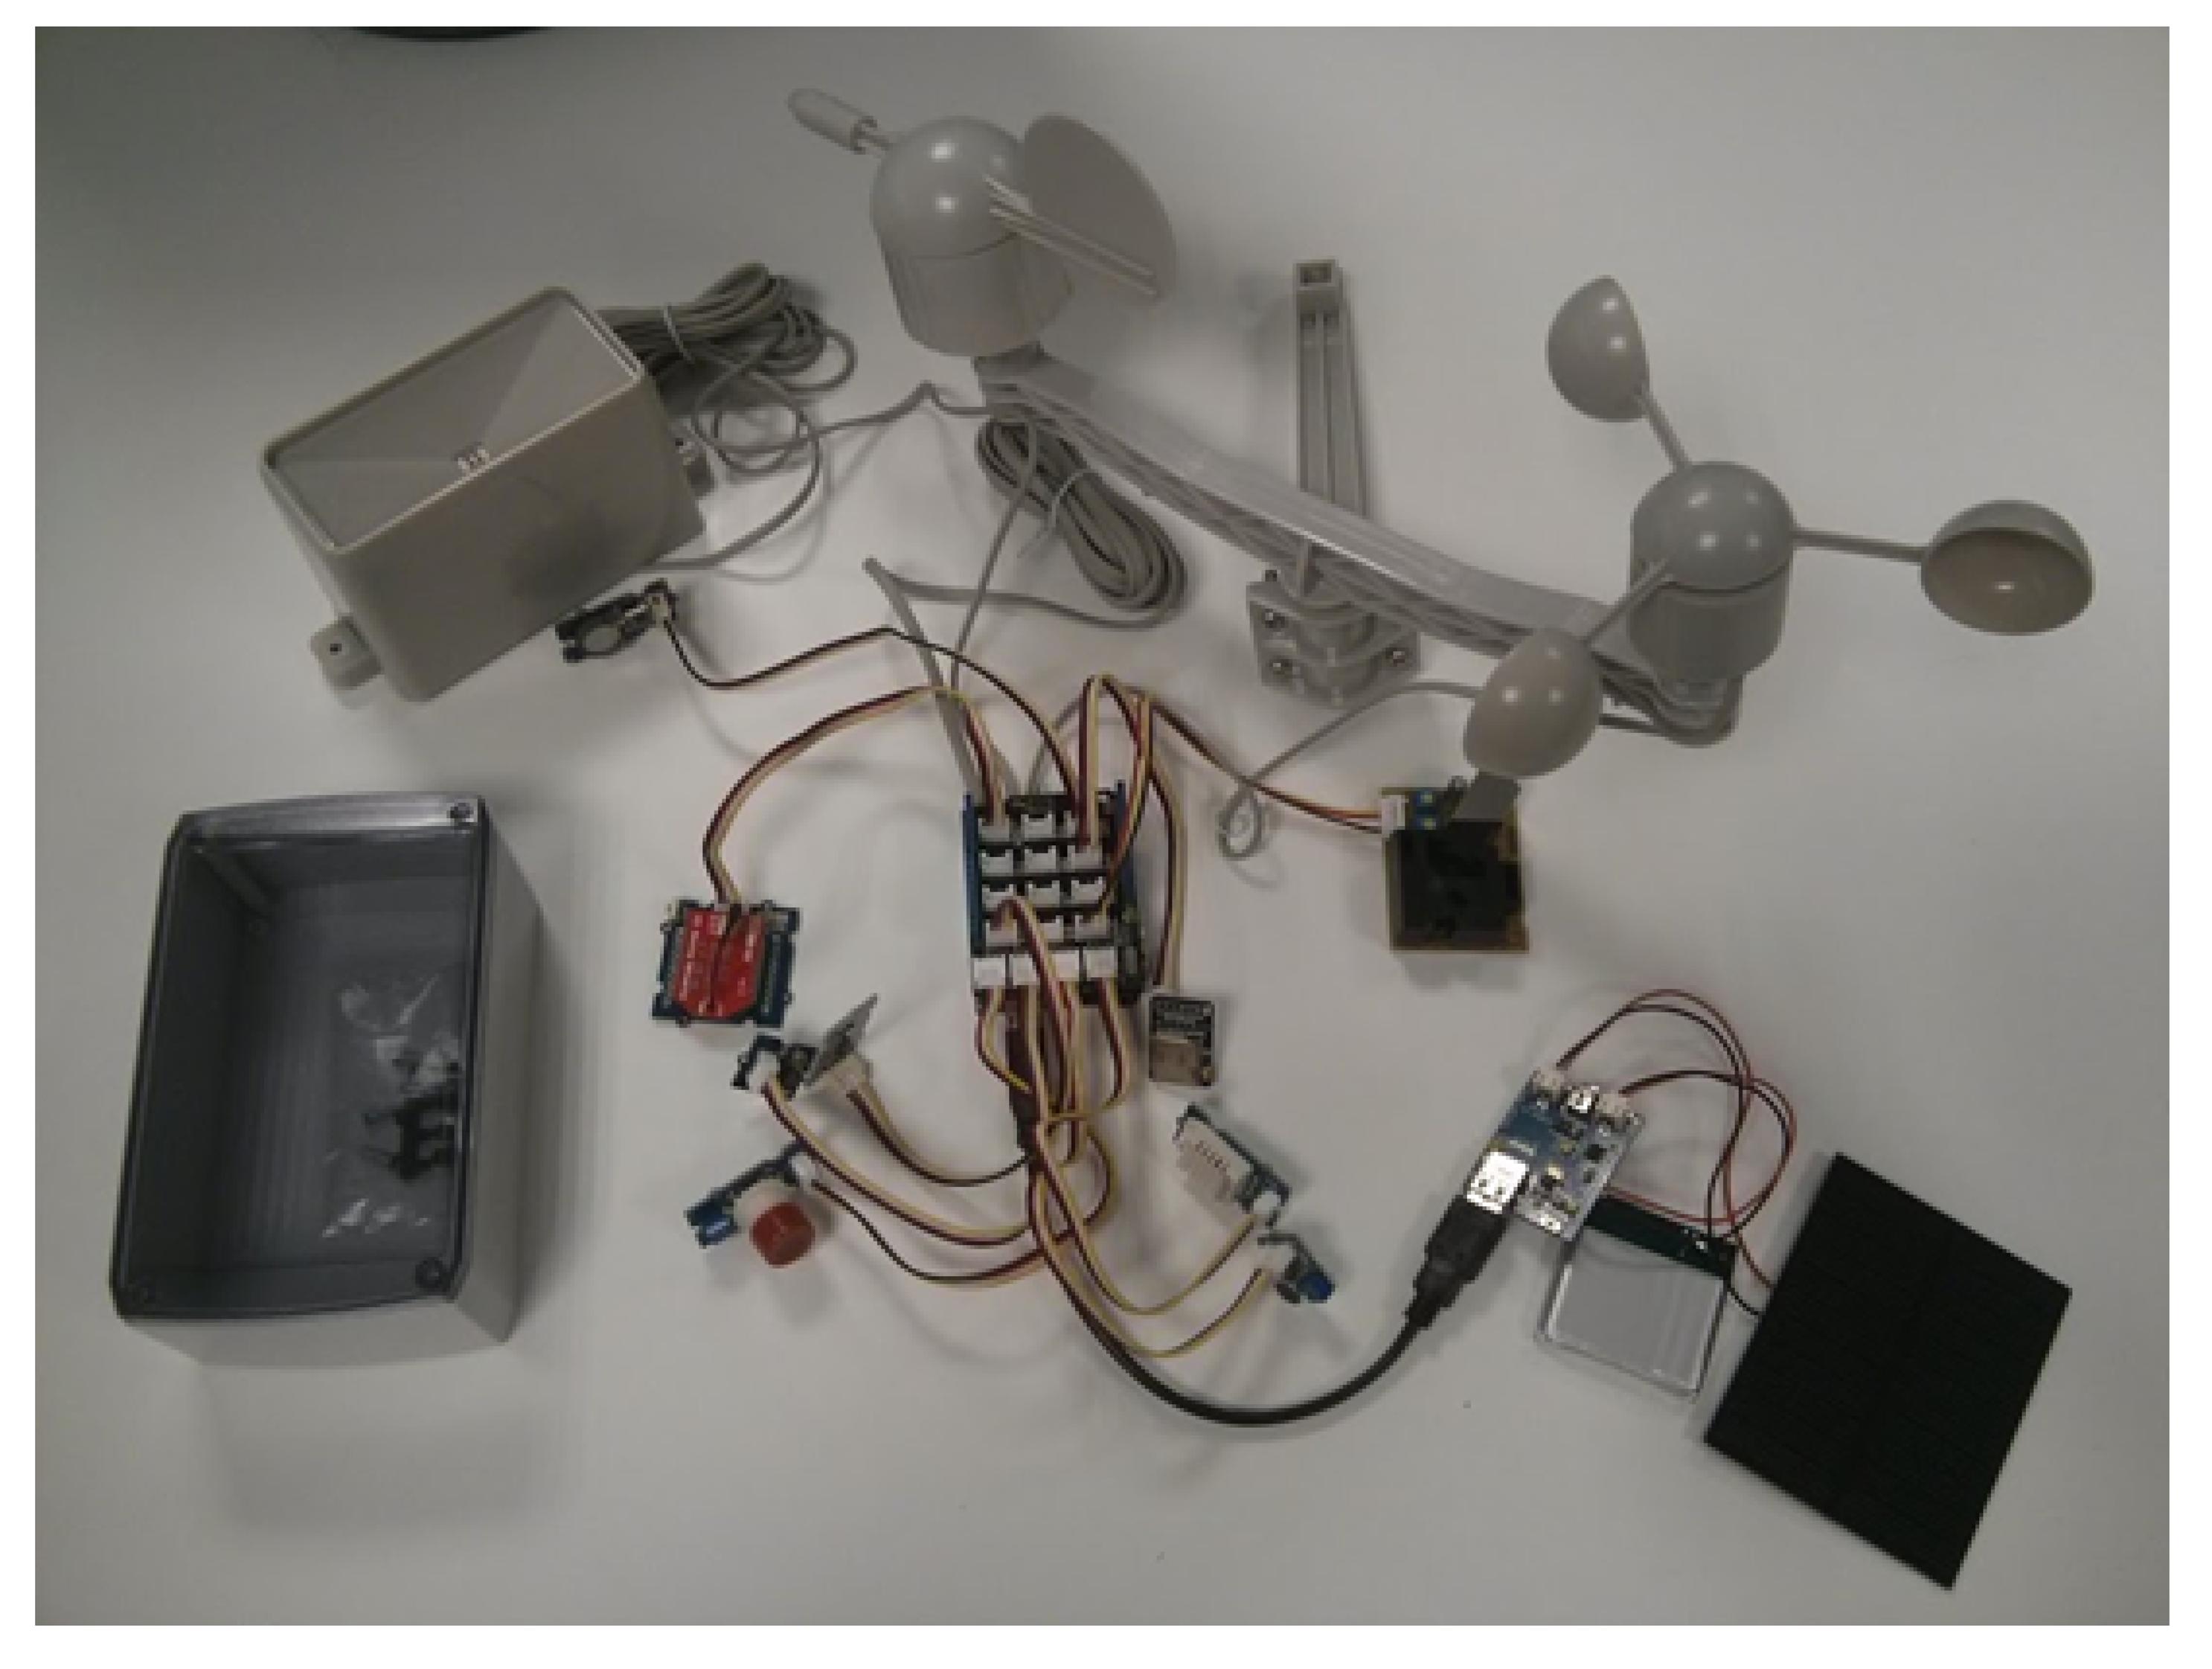 Sensors Free Full Text Senviro A Sensorized Platform Proposal Wiring Diagram Besides Cat 5 Cable On Goodman 15 05555f8 1024